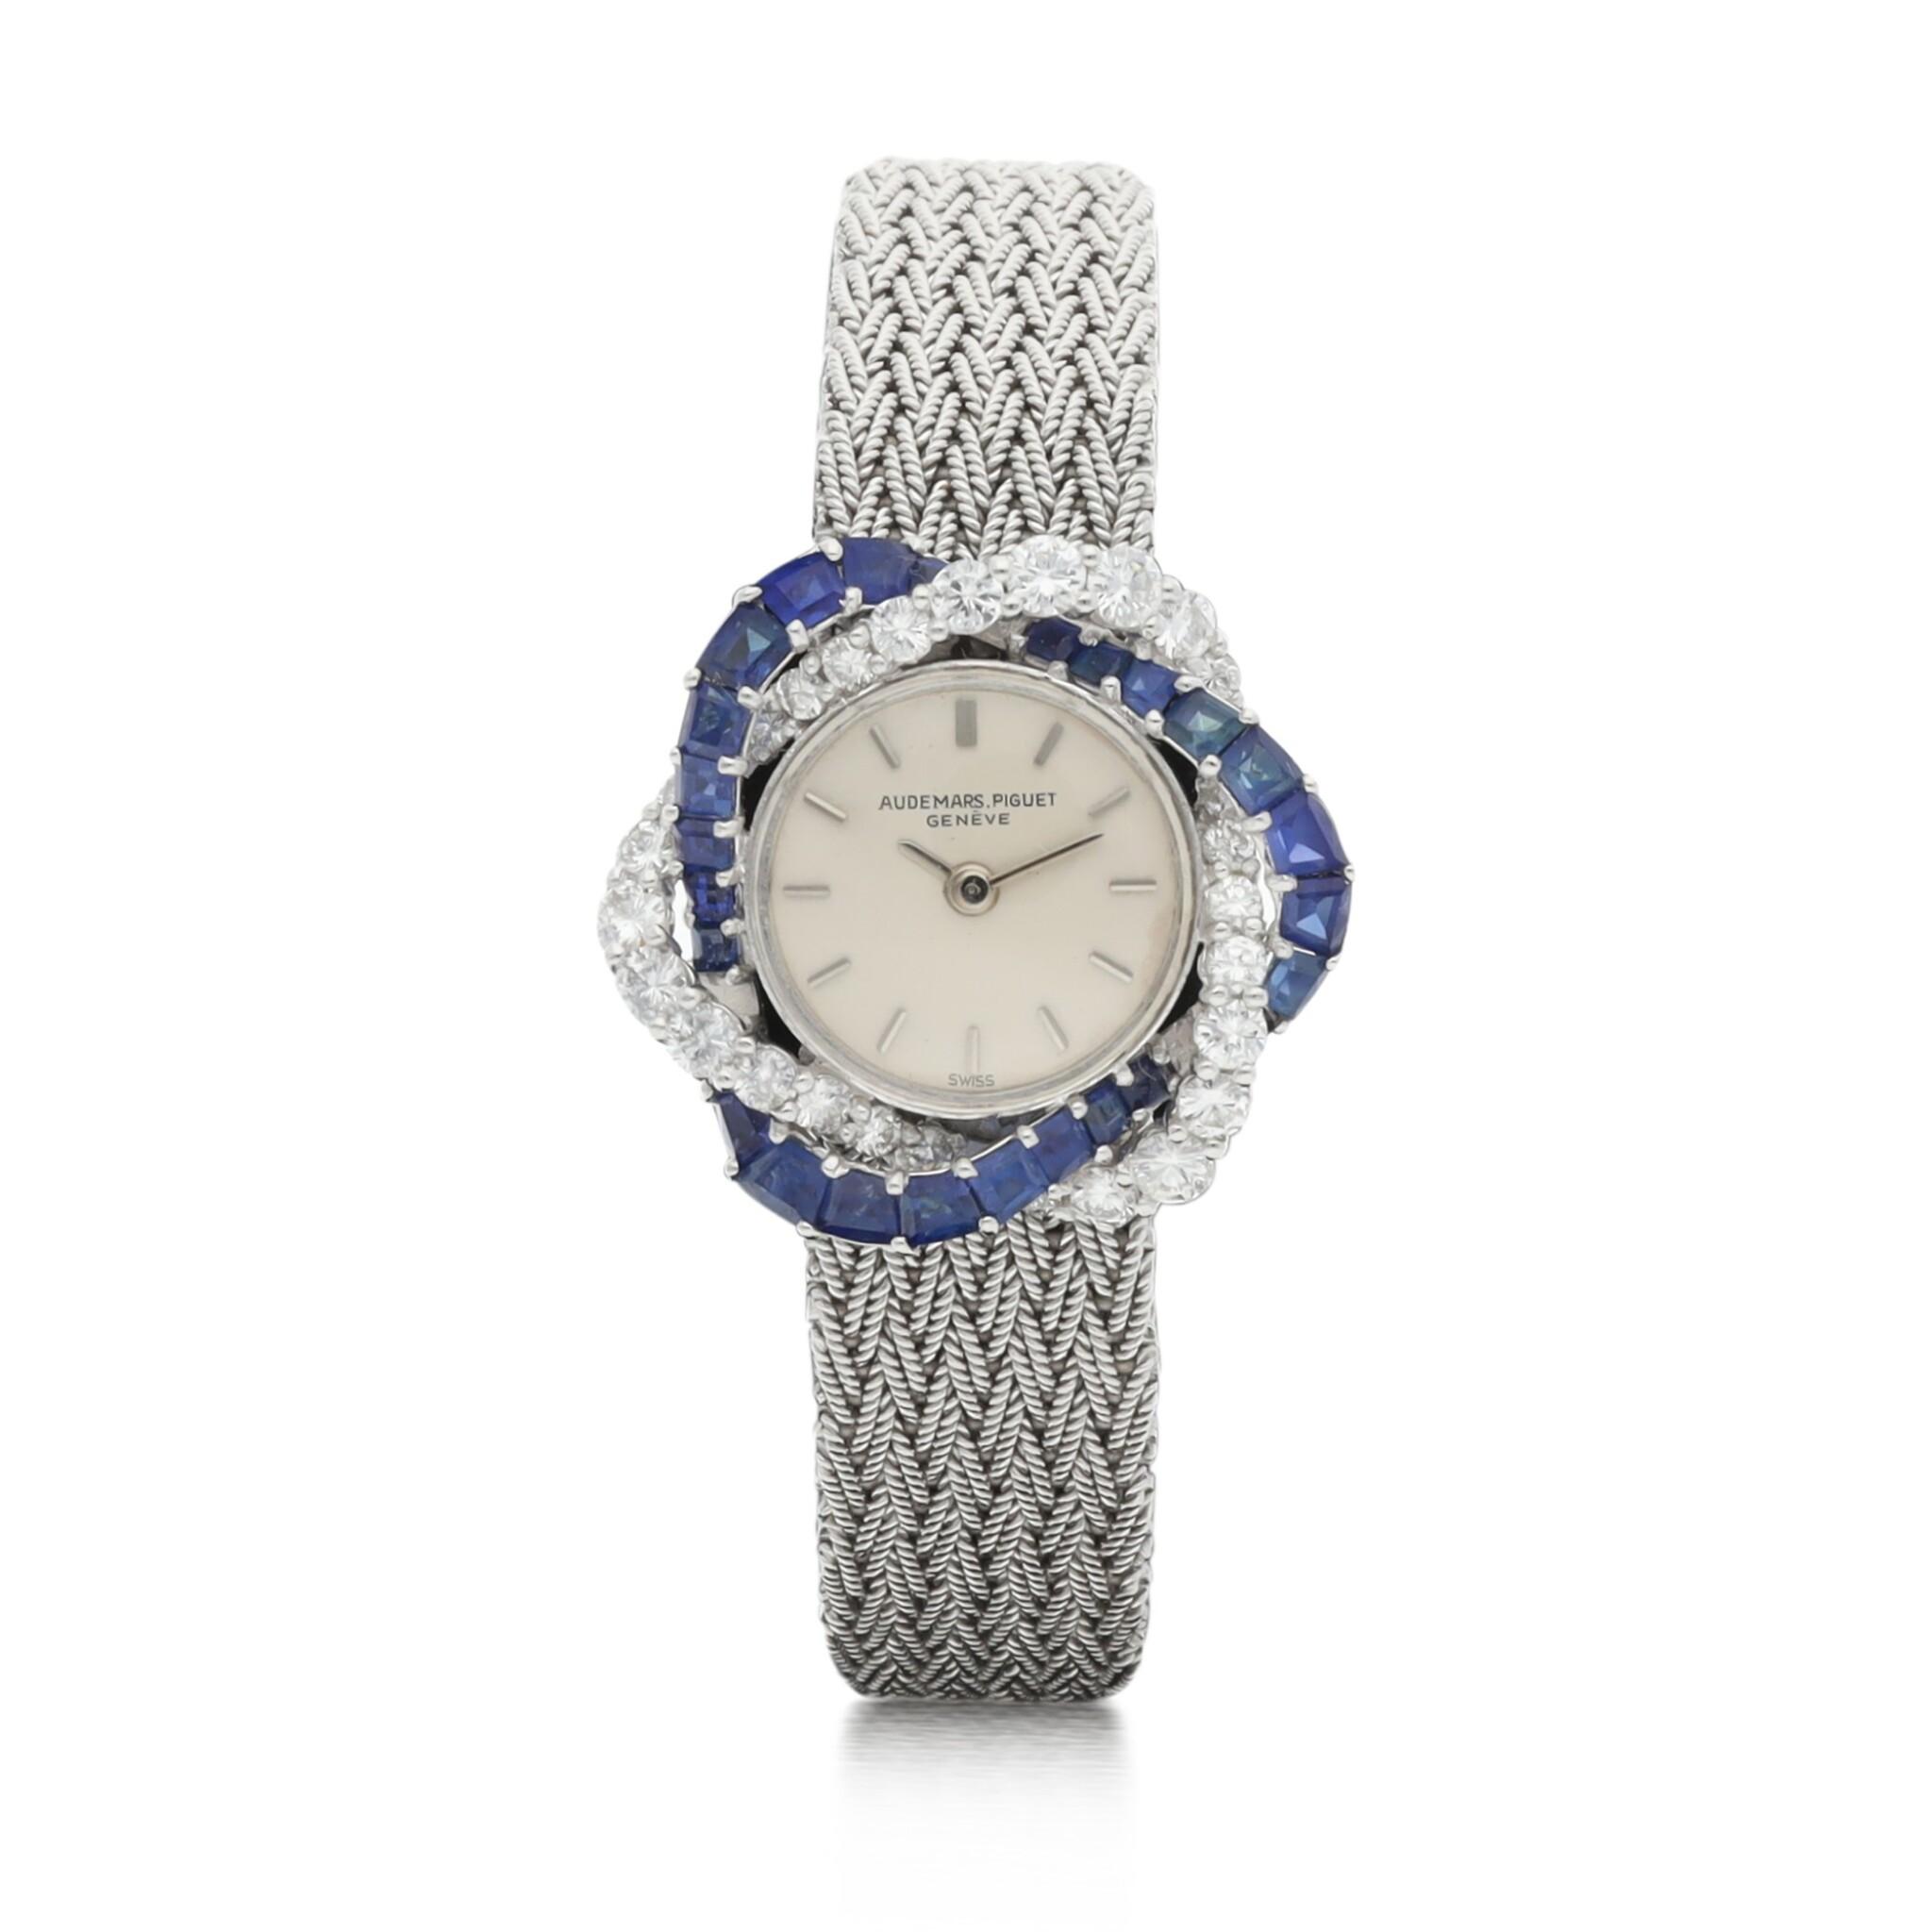 View 1 of Lot 8061. Audemars Piguet | Reference 9566, A white gold, diamond and sapphire-set bracelet watch, Circa 1960 | 愛彼 | 型號9566   白金鑲鑽石及藍寶石鏈帶腕錶,約1960年製.